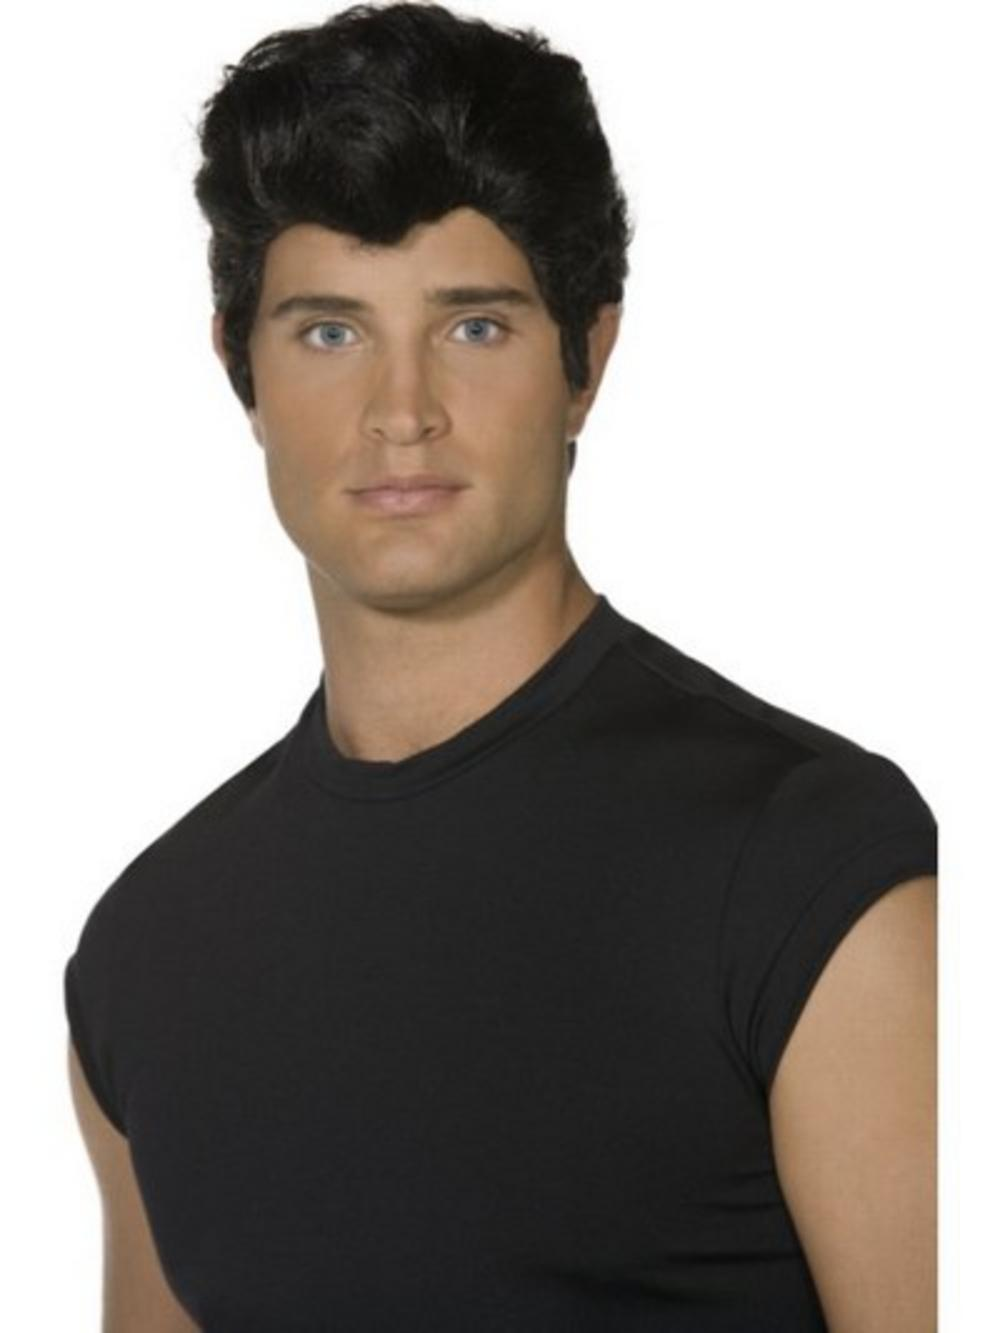 Danny zuko black t shirt - Grease Danny Zuko Wig